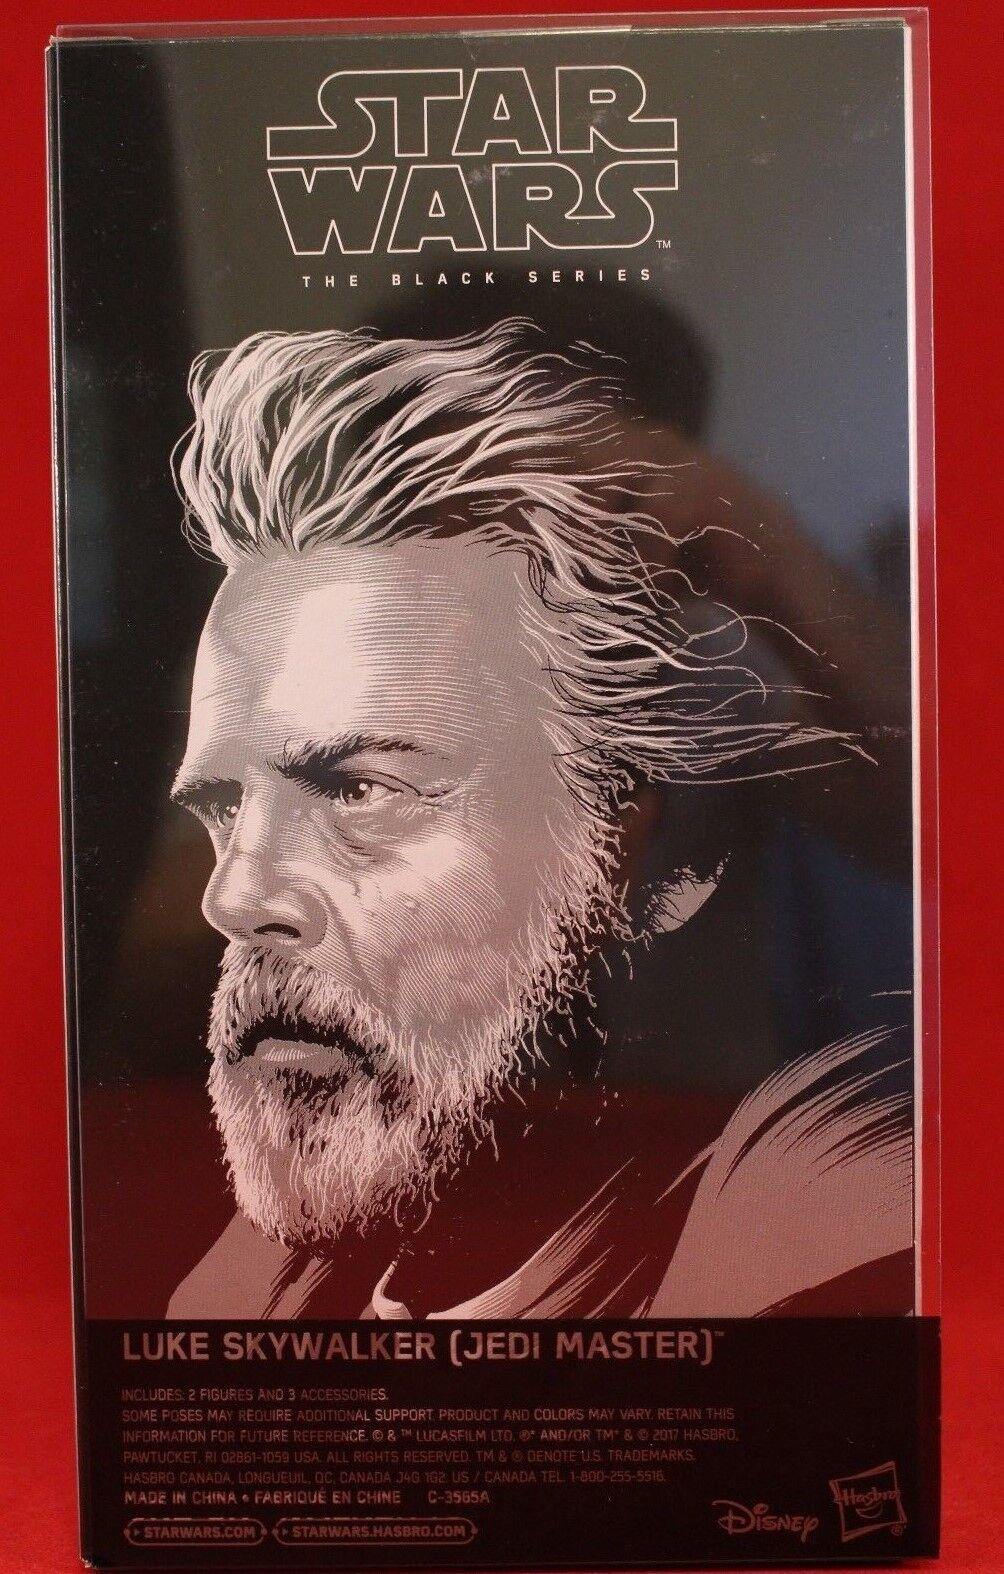 SDCC 2017 Star Wars  The Last Jedi Jedi Jedi Exclusive Luke Skywalker & Rey Action Figures 4046a5